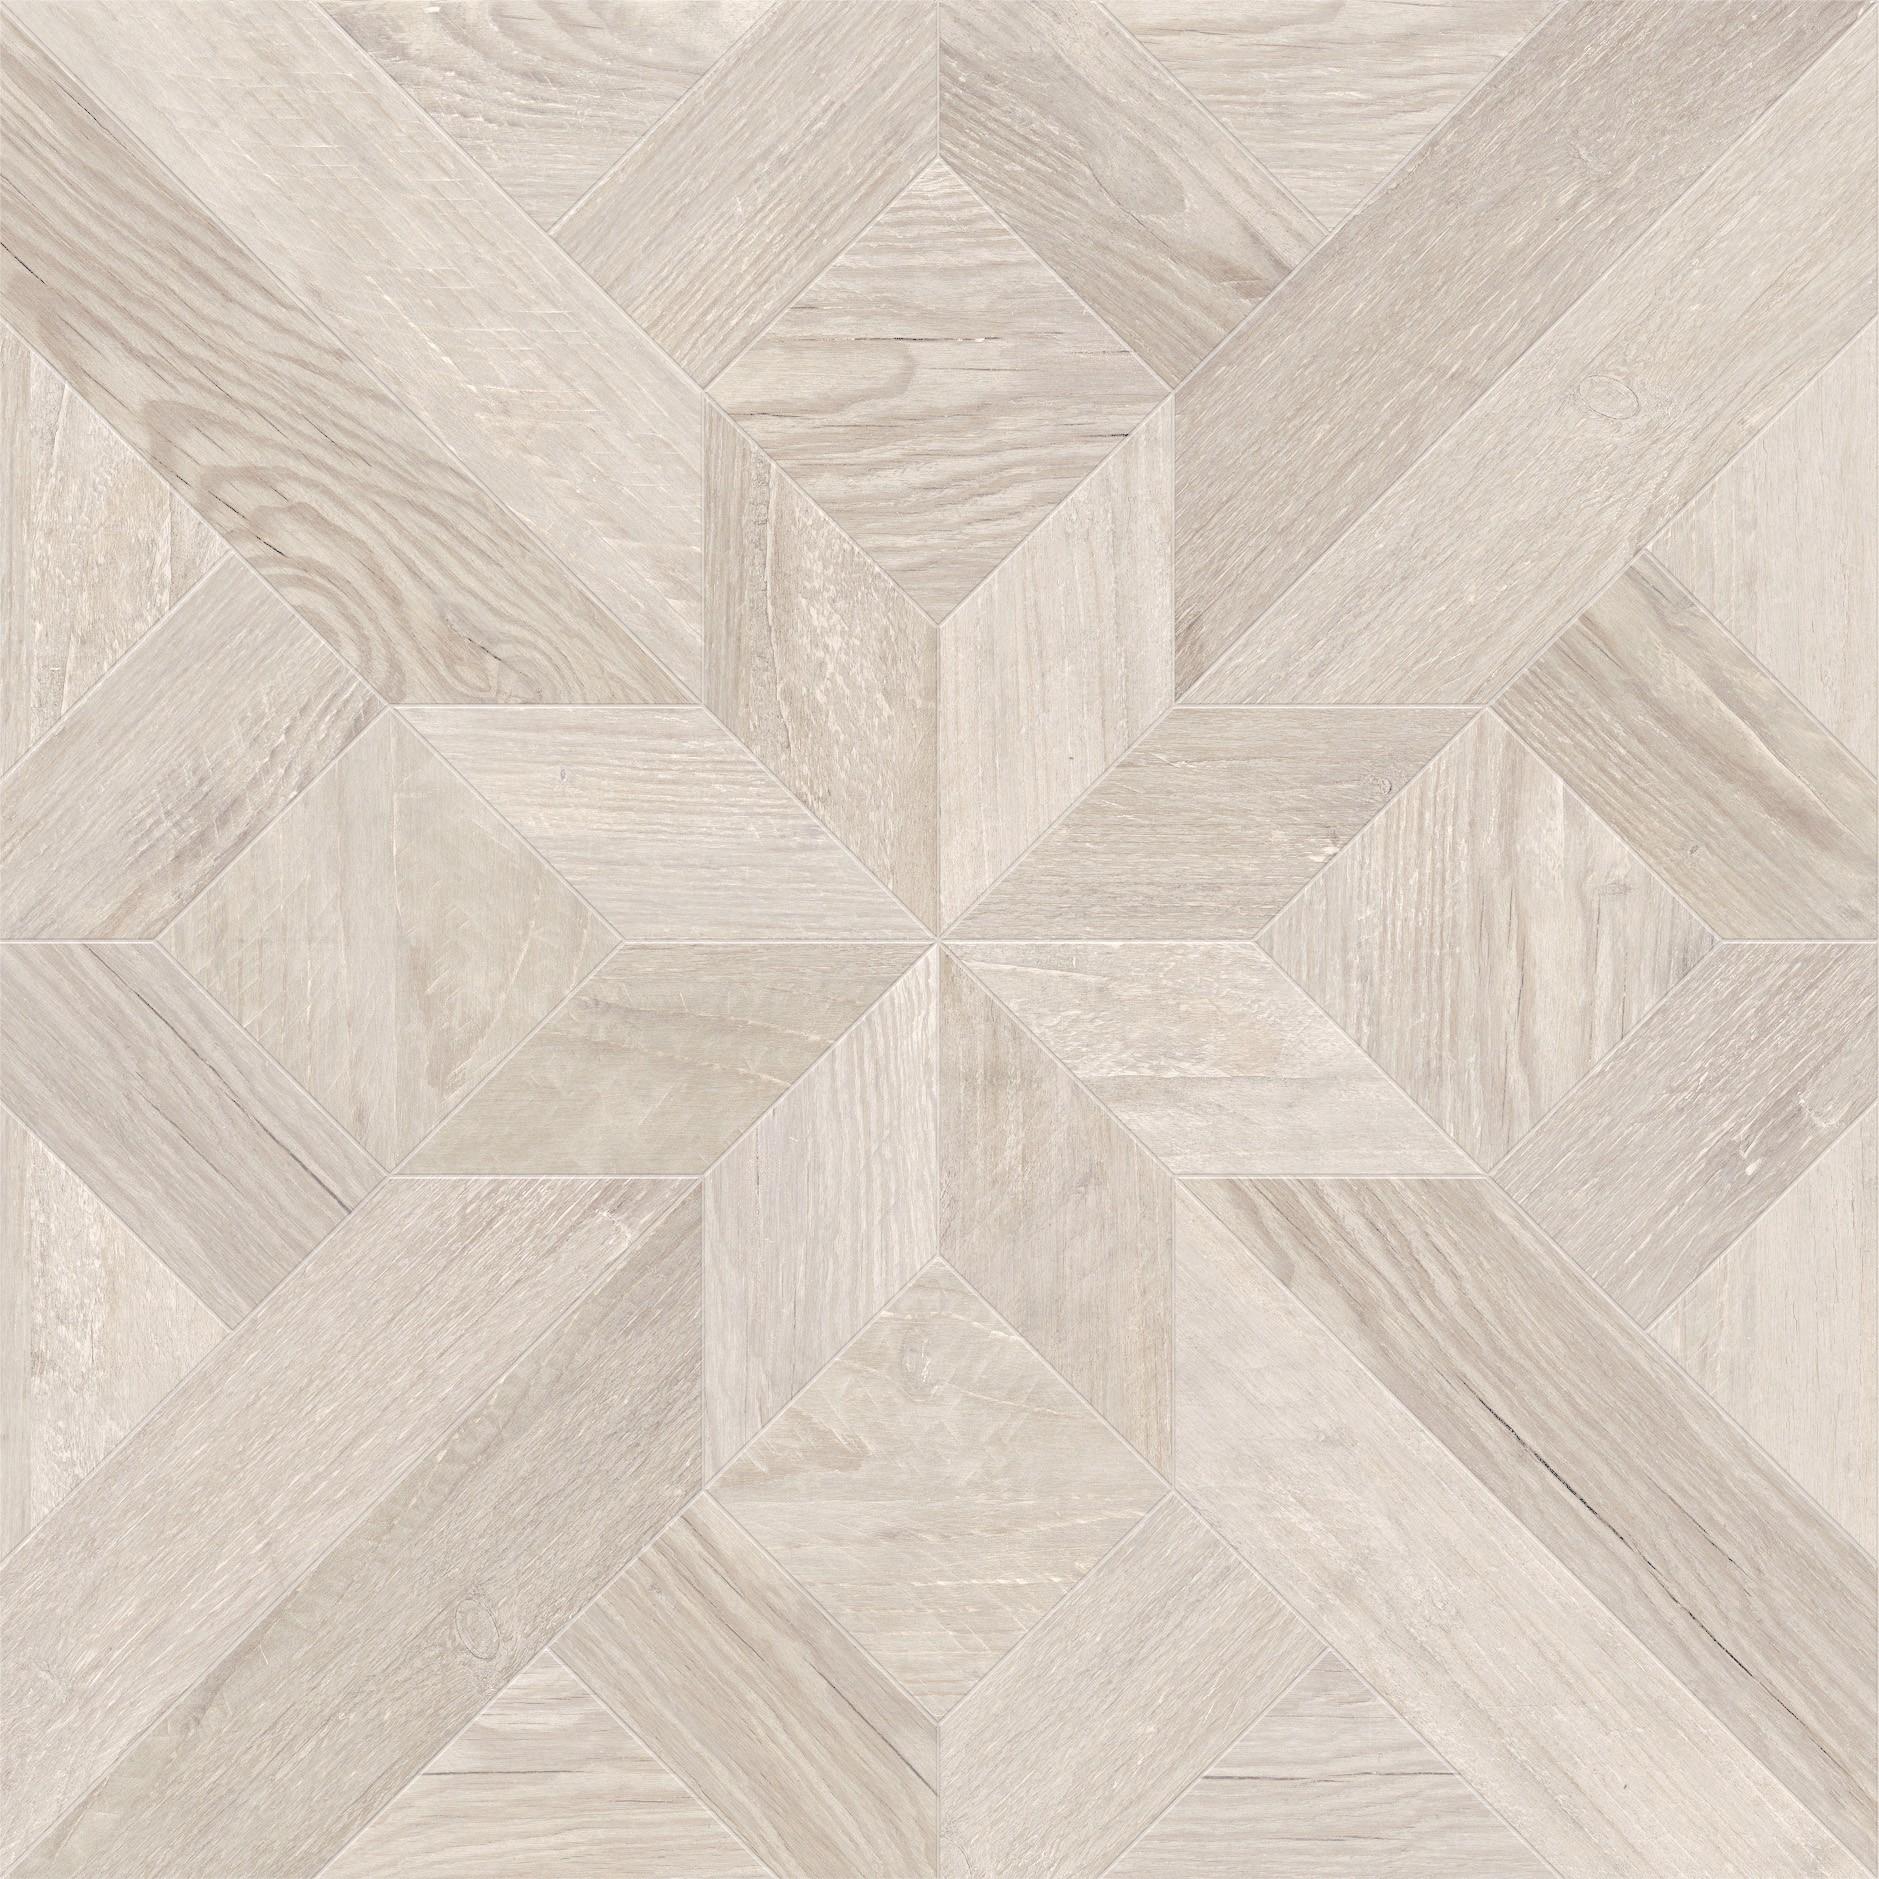 Керамограніт підлога Dubrava 60.4х60.4 beige